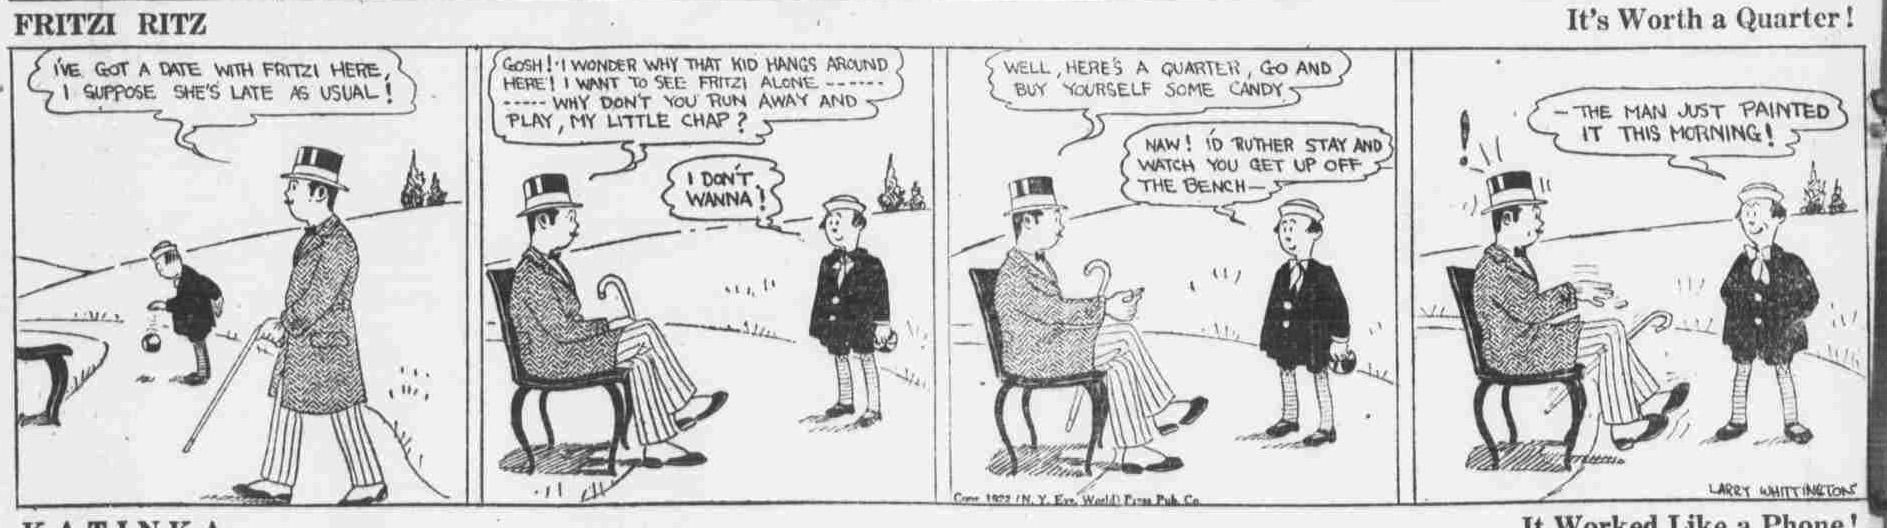 Dec. 13, 1922